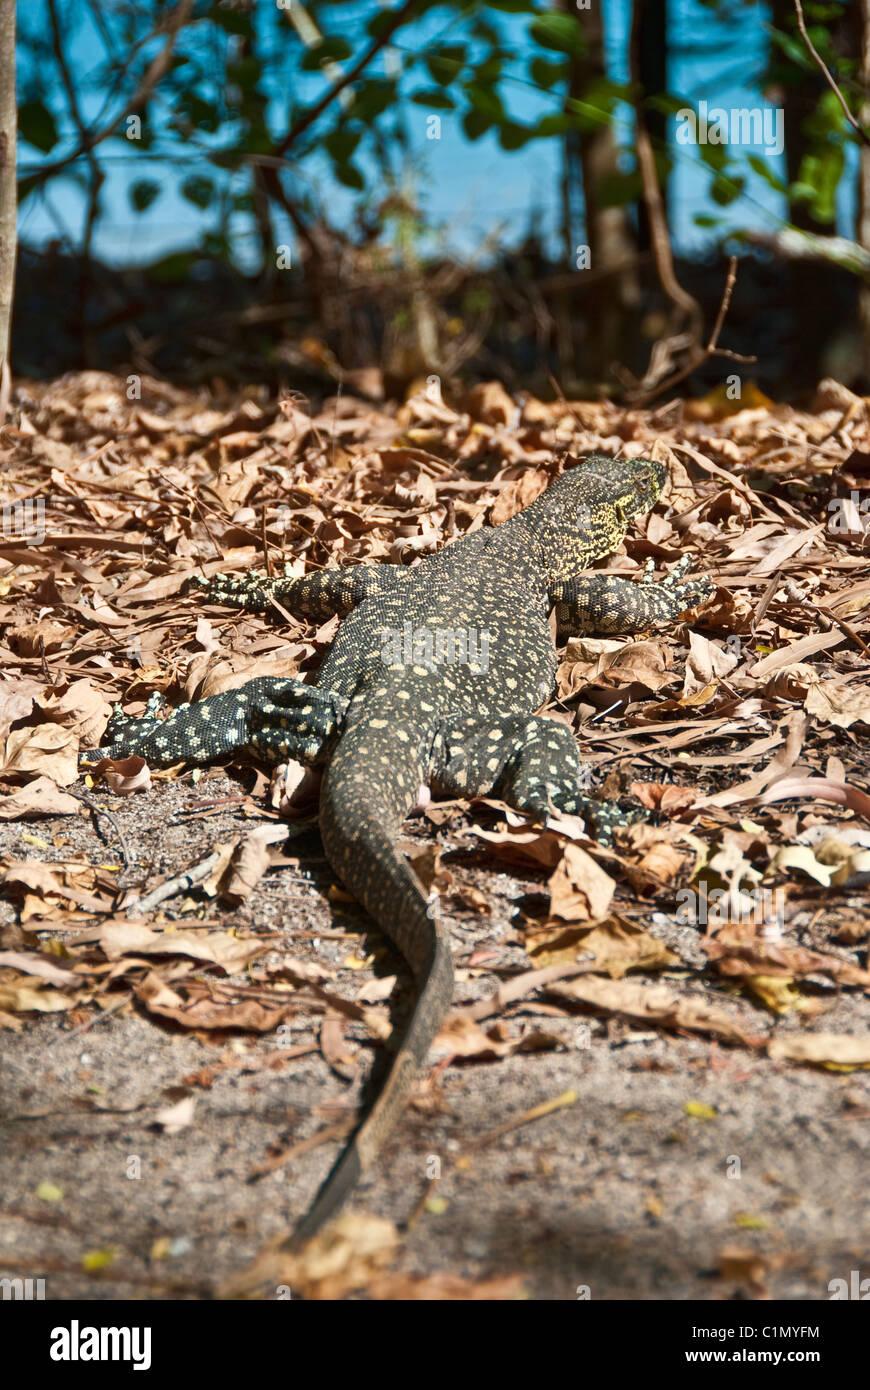 Monitor Lizard in the Whitsunday Islands Archipelago Stock Photo